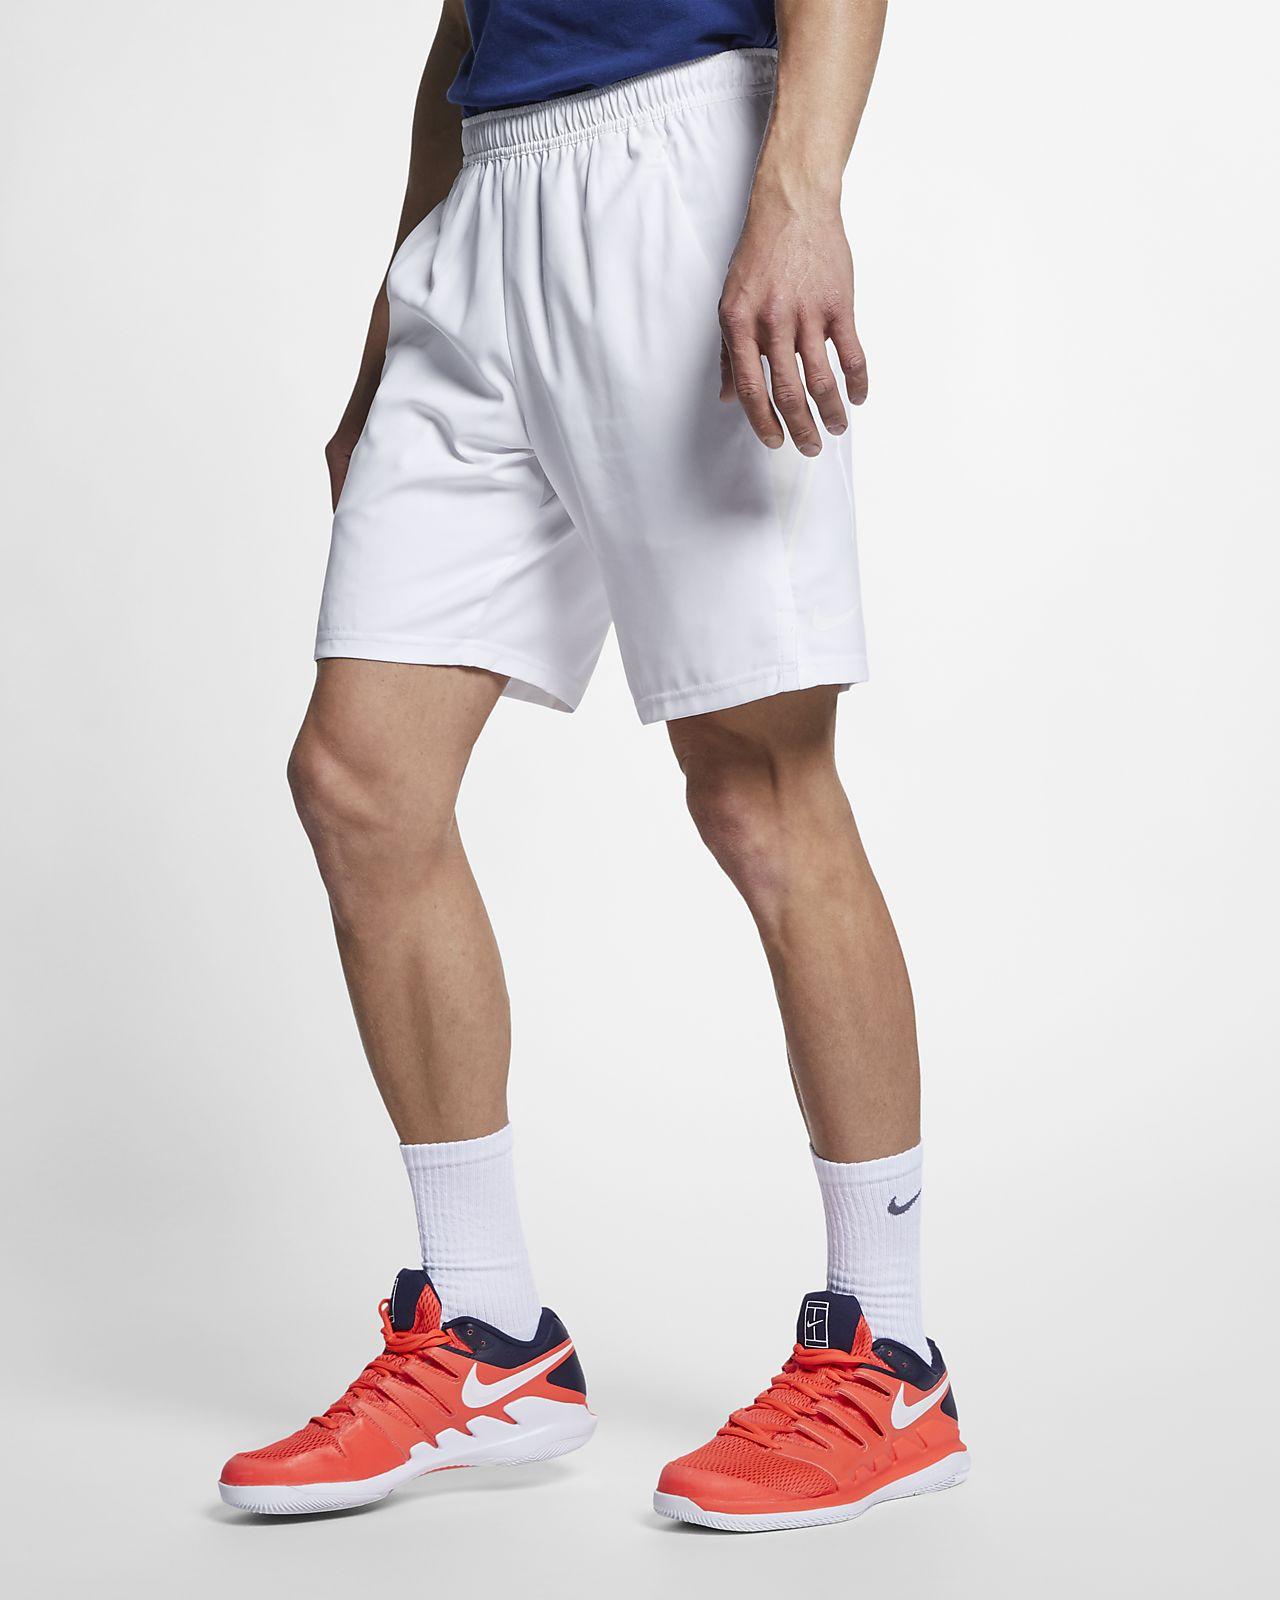 NikeCourt Dri-FIT 23 cm Erkek Tenis Şortu